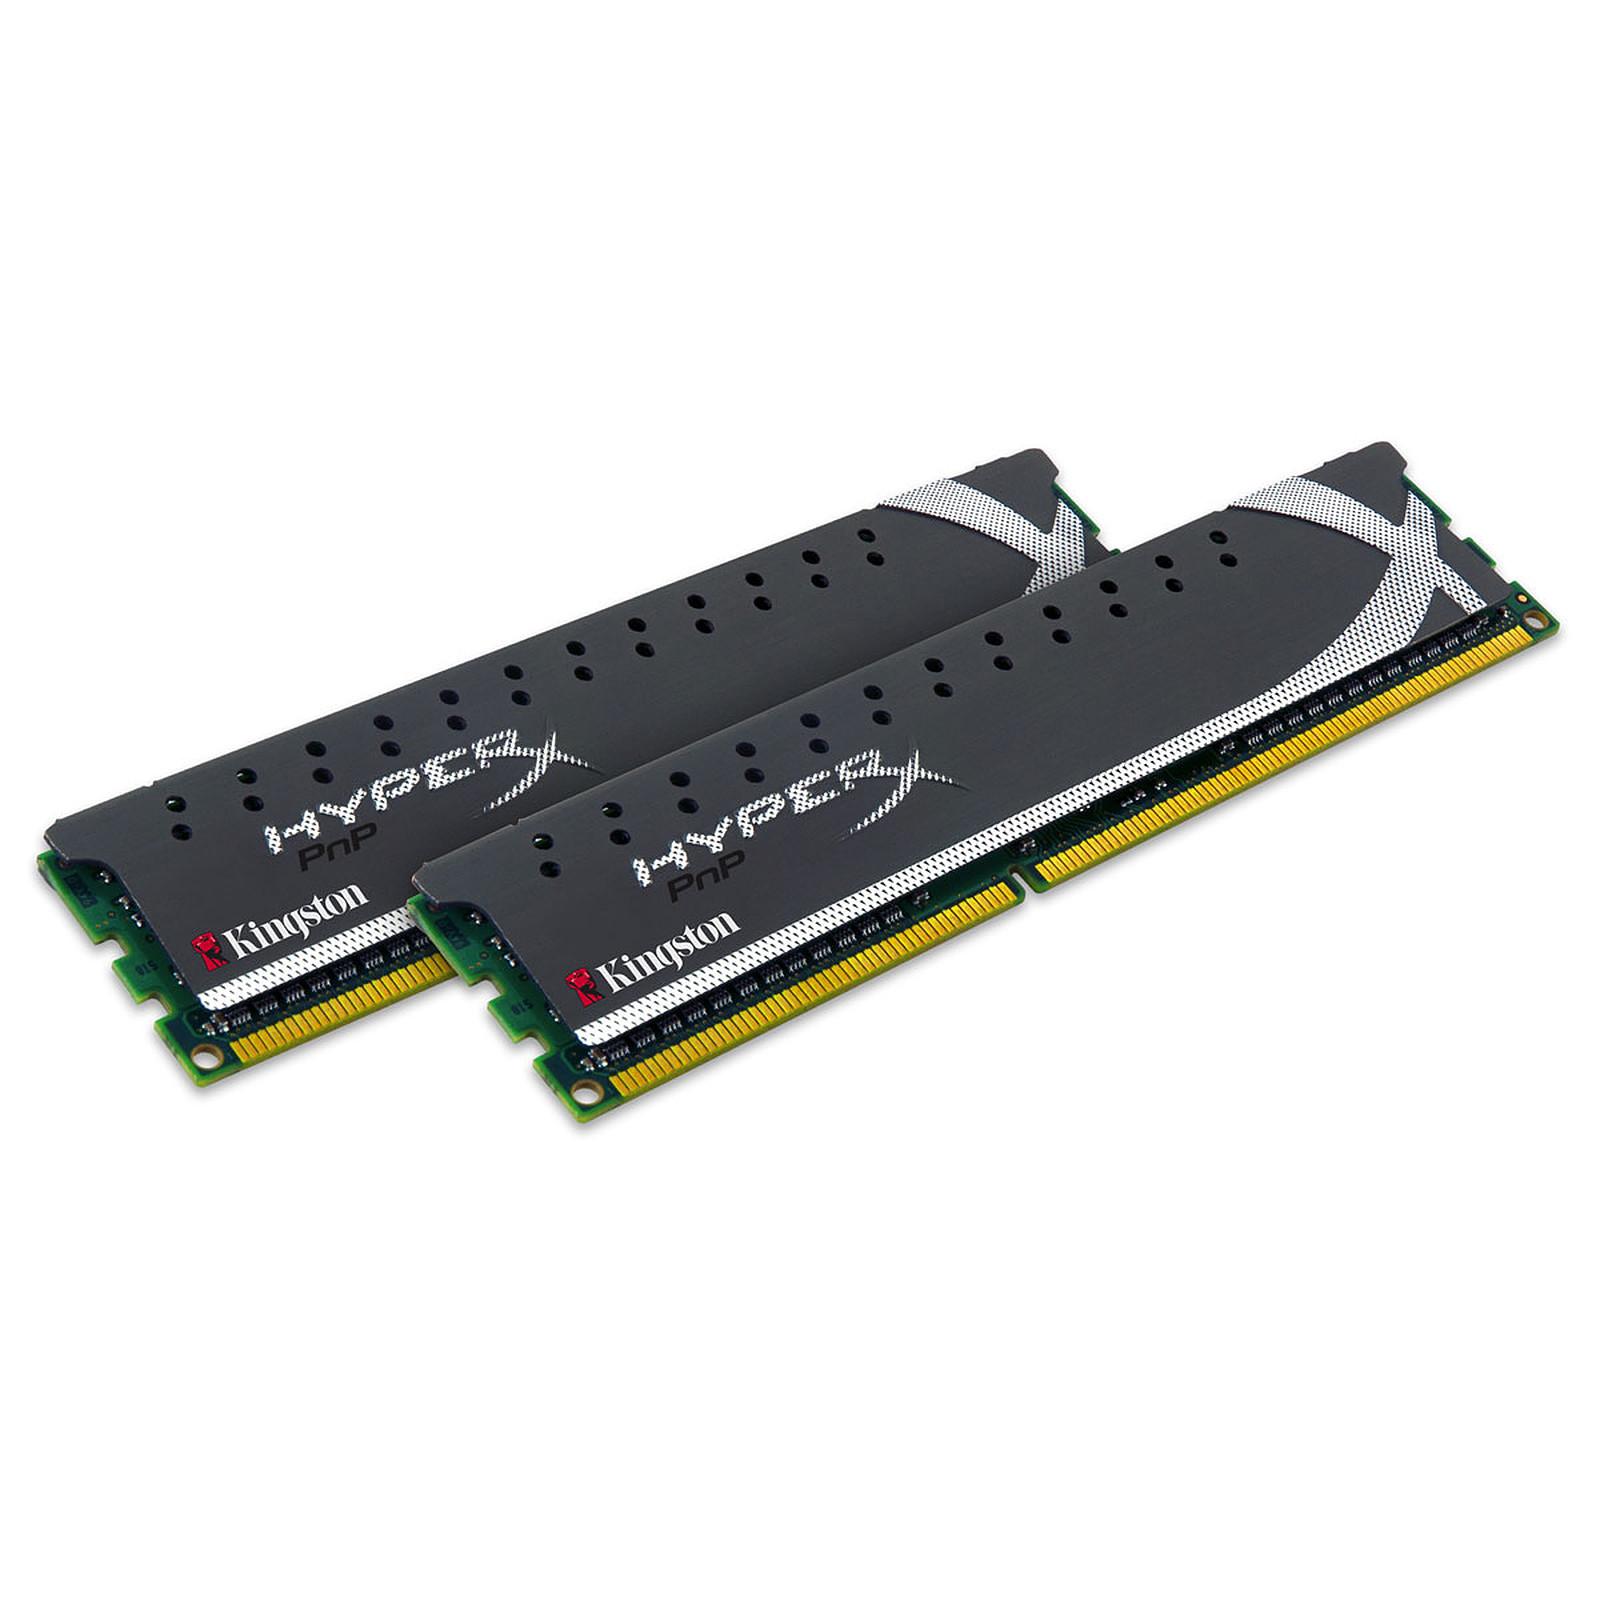 Kingston HyperX PnP 16 Go (2x 8 Go) DDR3 1866 MHz CL11